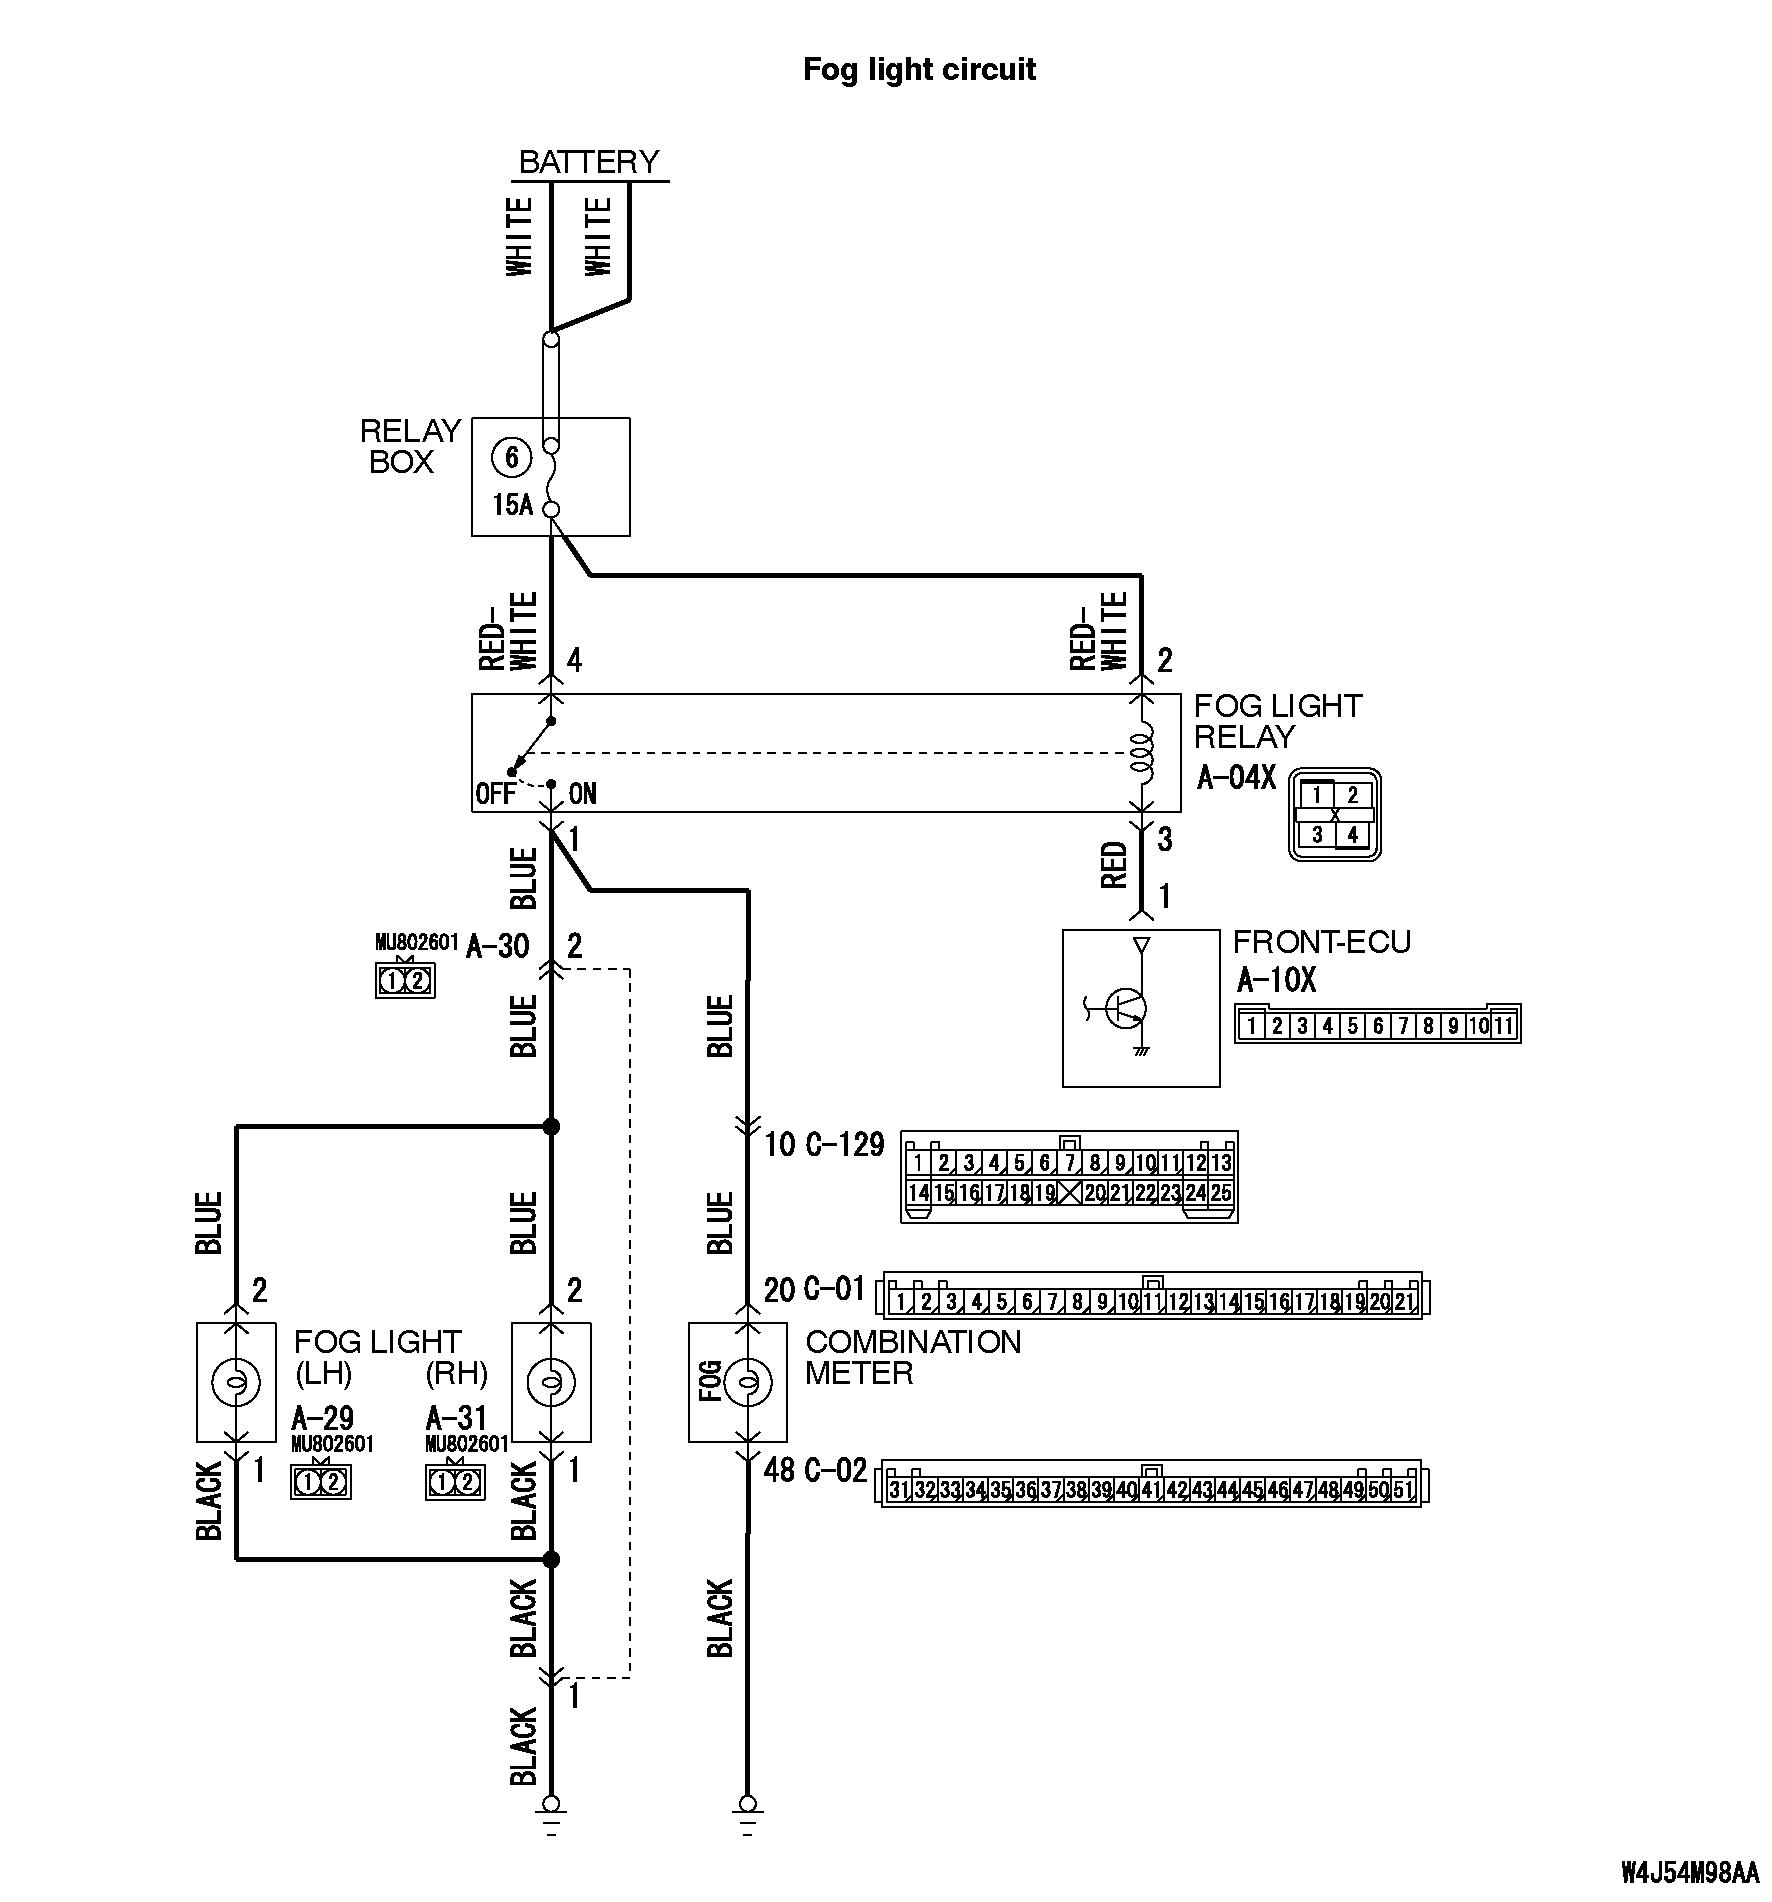 95405d1156140537 ralliart stock fog light wiring diagram m2285404_00330?resize\\\\\\\\\\\\\\\\\\\\\\\=665%2C714 loanplus cms wiring diagrams gandul 45 77 79 119  at gsmx.co